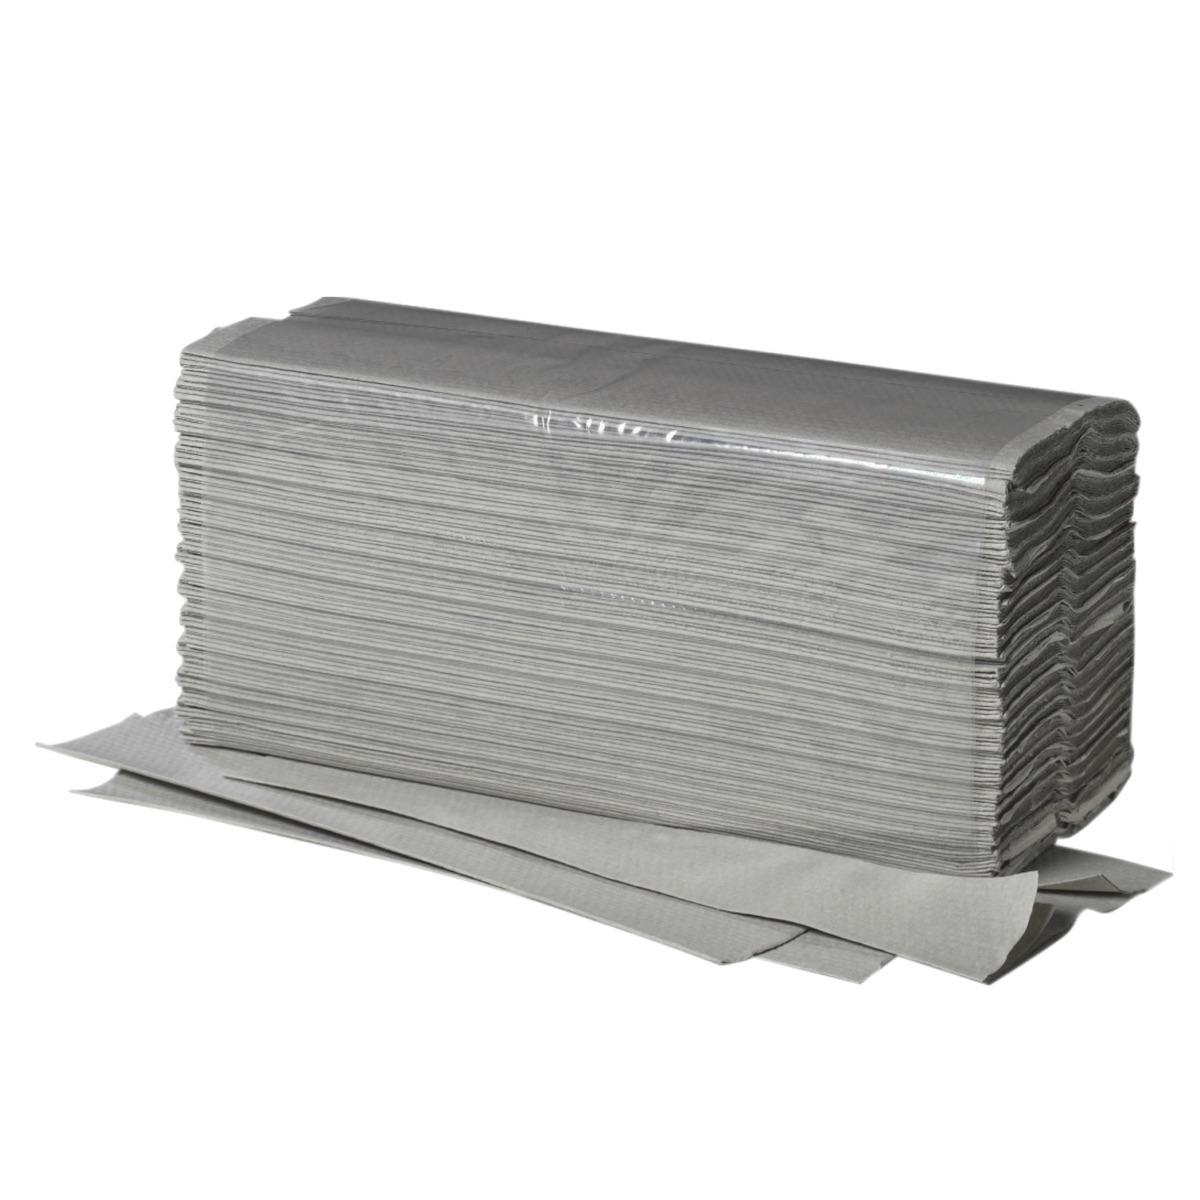 E-Handtücher Fripa Plus 25x33cm 1-lg,C-Falz grau, 3120Stk,